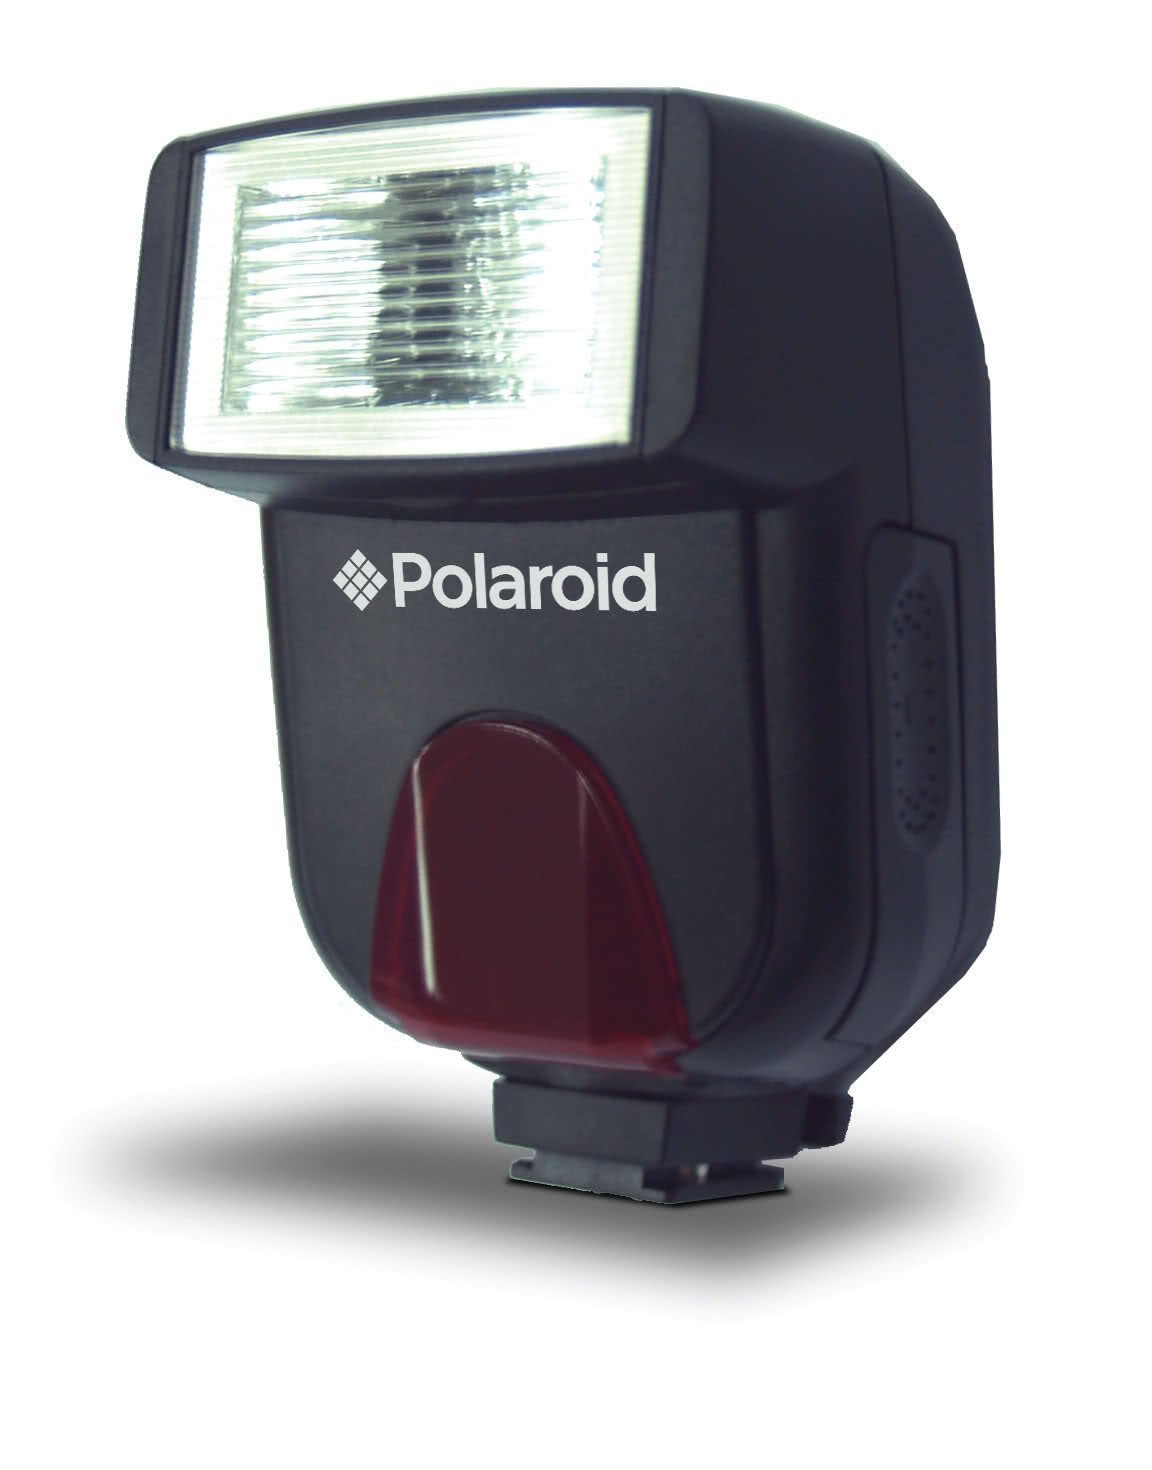 Polaroid PL108AF Studio Auto Focus TTL Flash for Nikon - PL108-AF-N by Polaroid